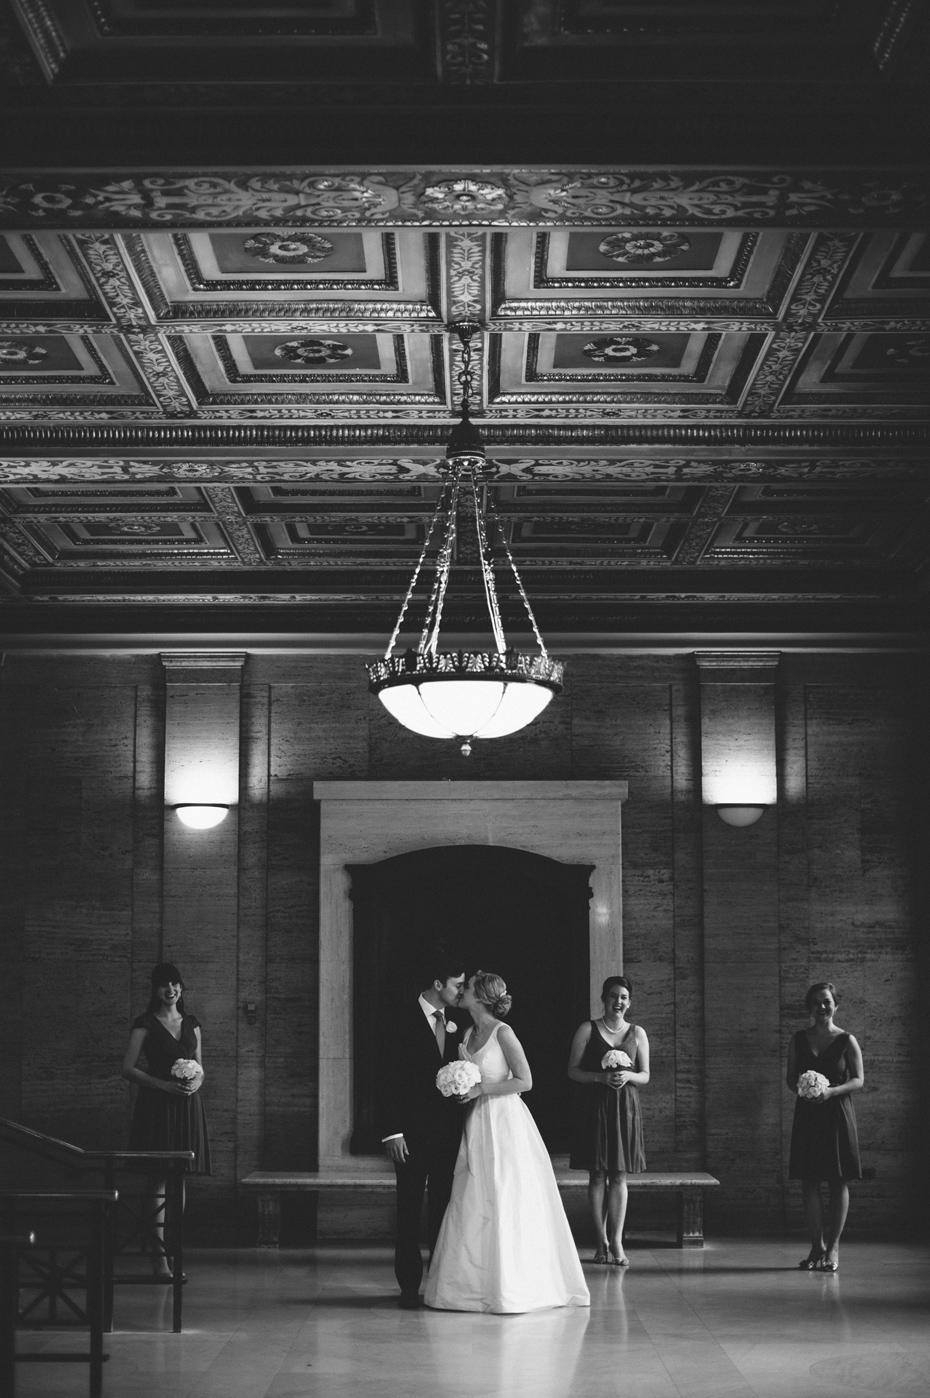 A bridal party portrait at Angell Hall in Ann Arbor, shot by wedding photographer Heather Jowett